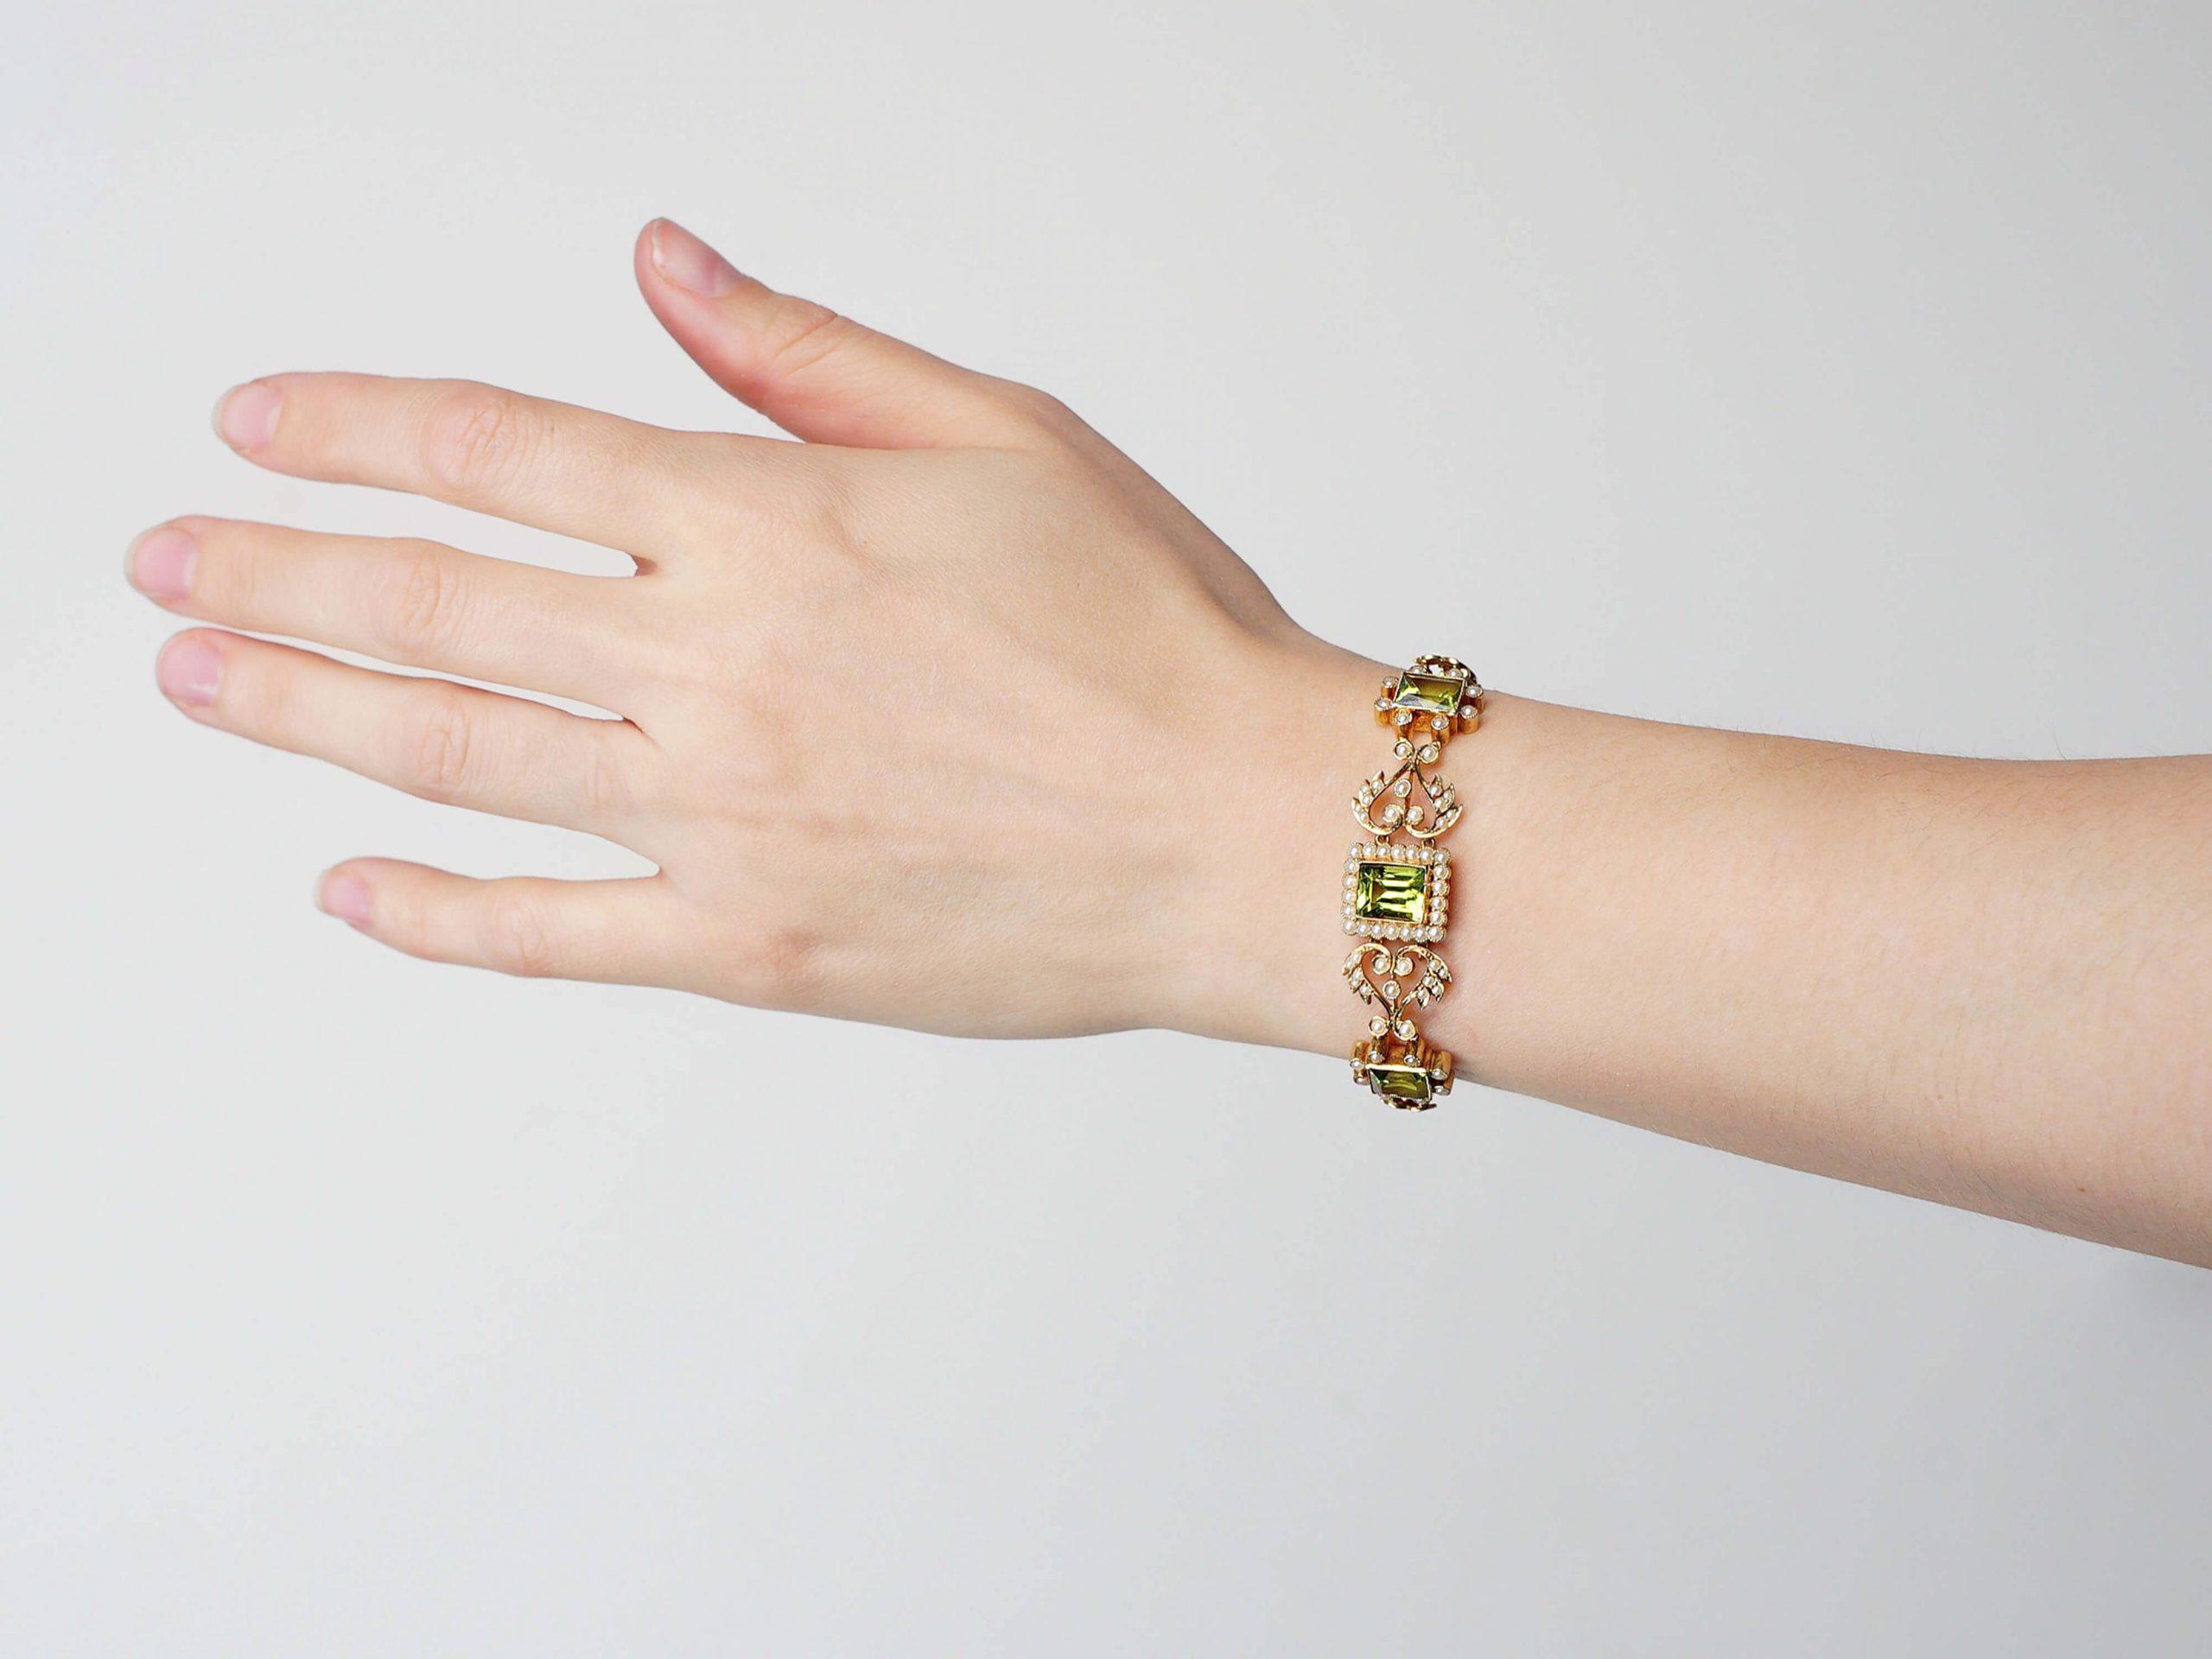 Edwardian 15ct Gold, Peridot & Natural Split Pearl Bracelet